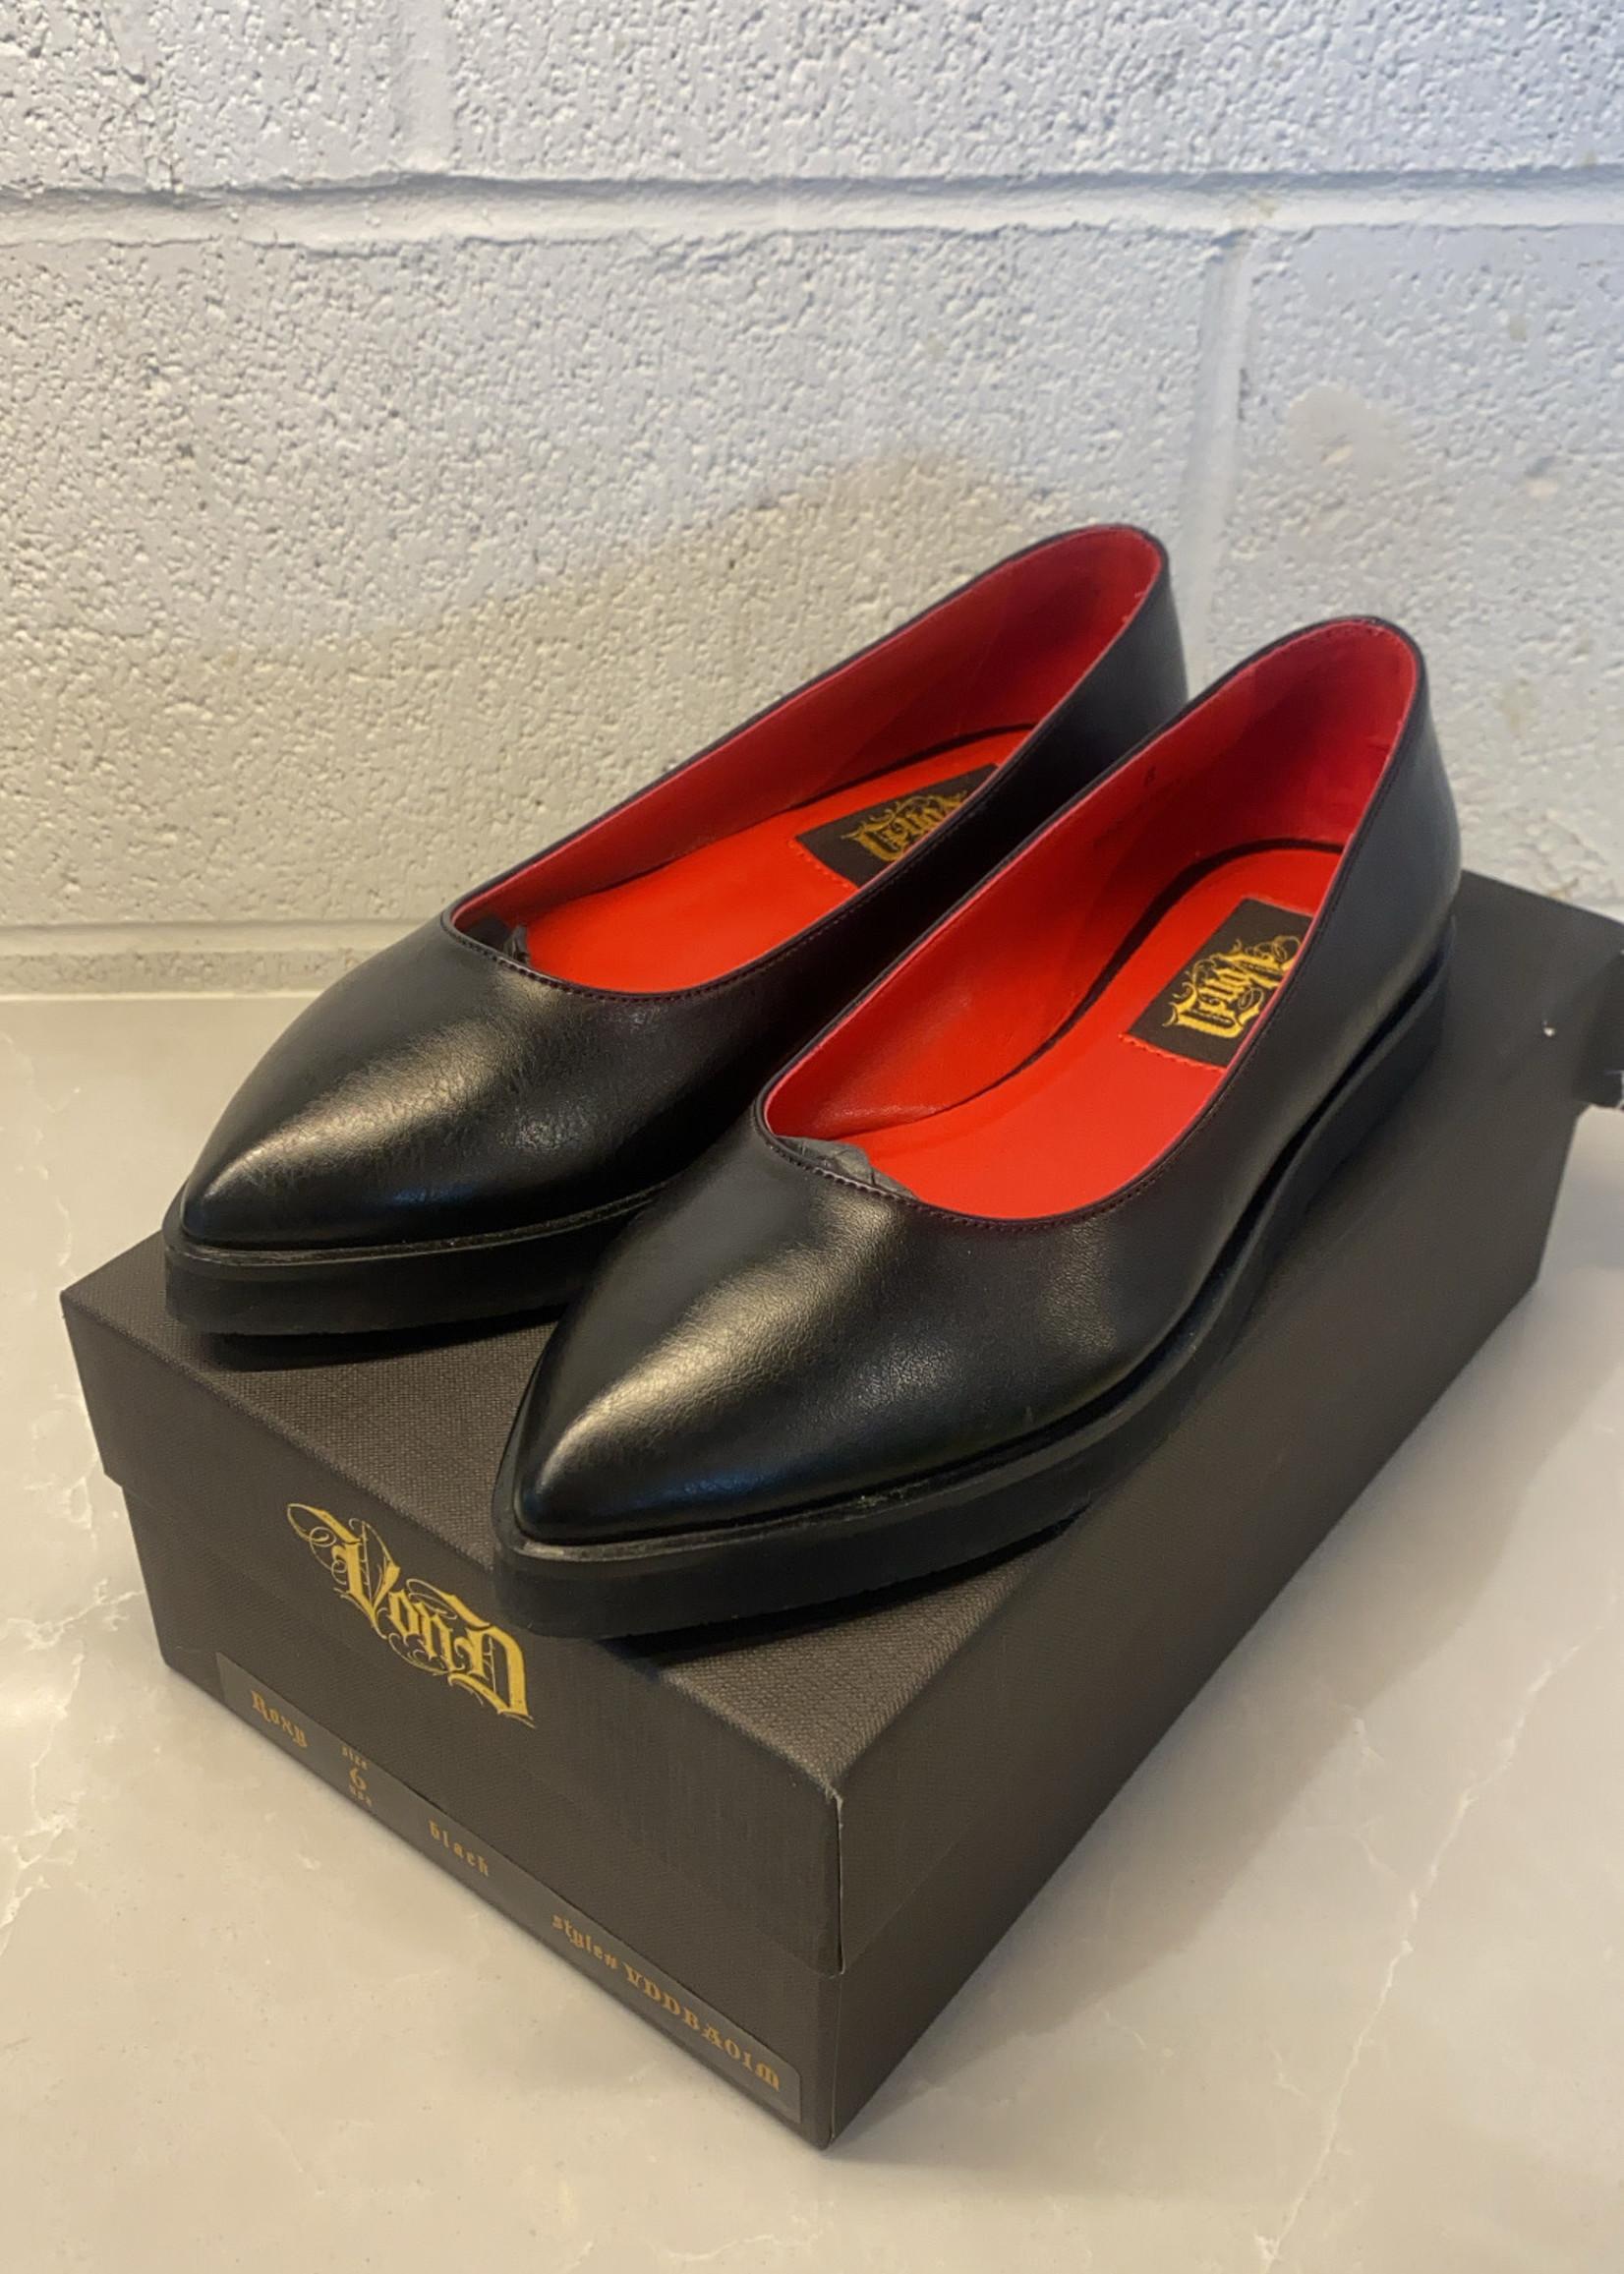 VonD 'Roxy' Vegan Flats (Retail: $159)